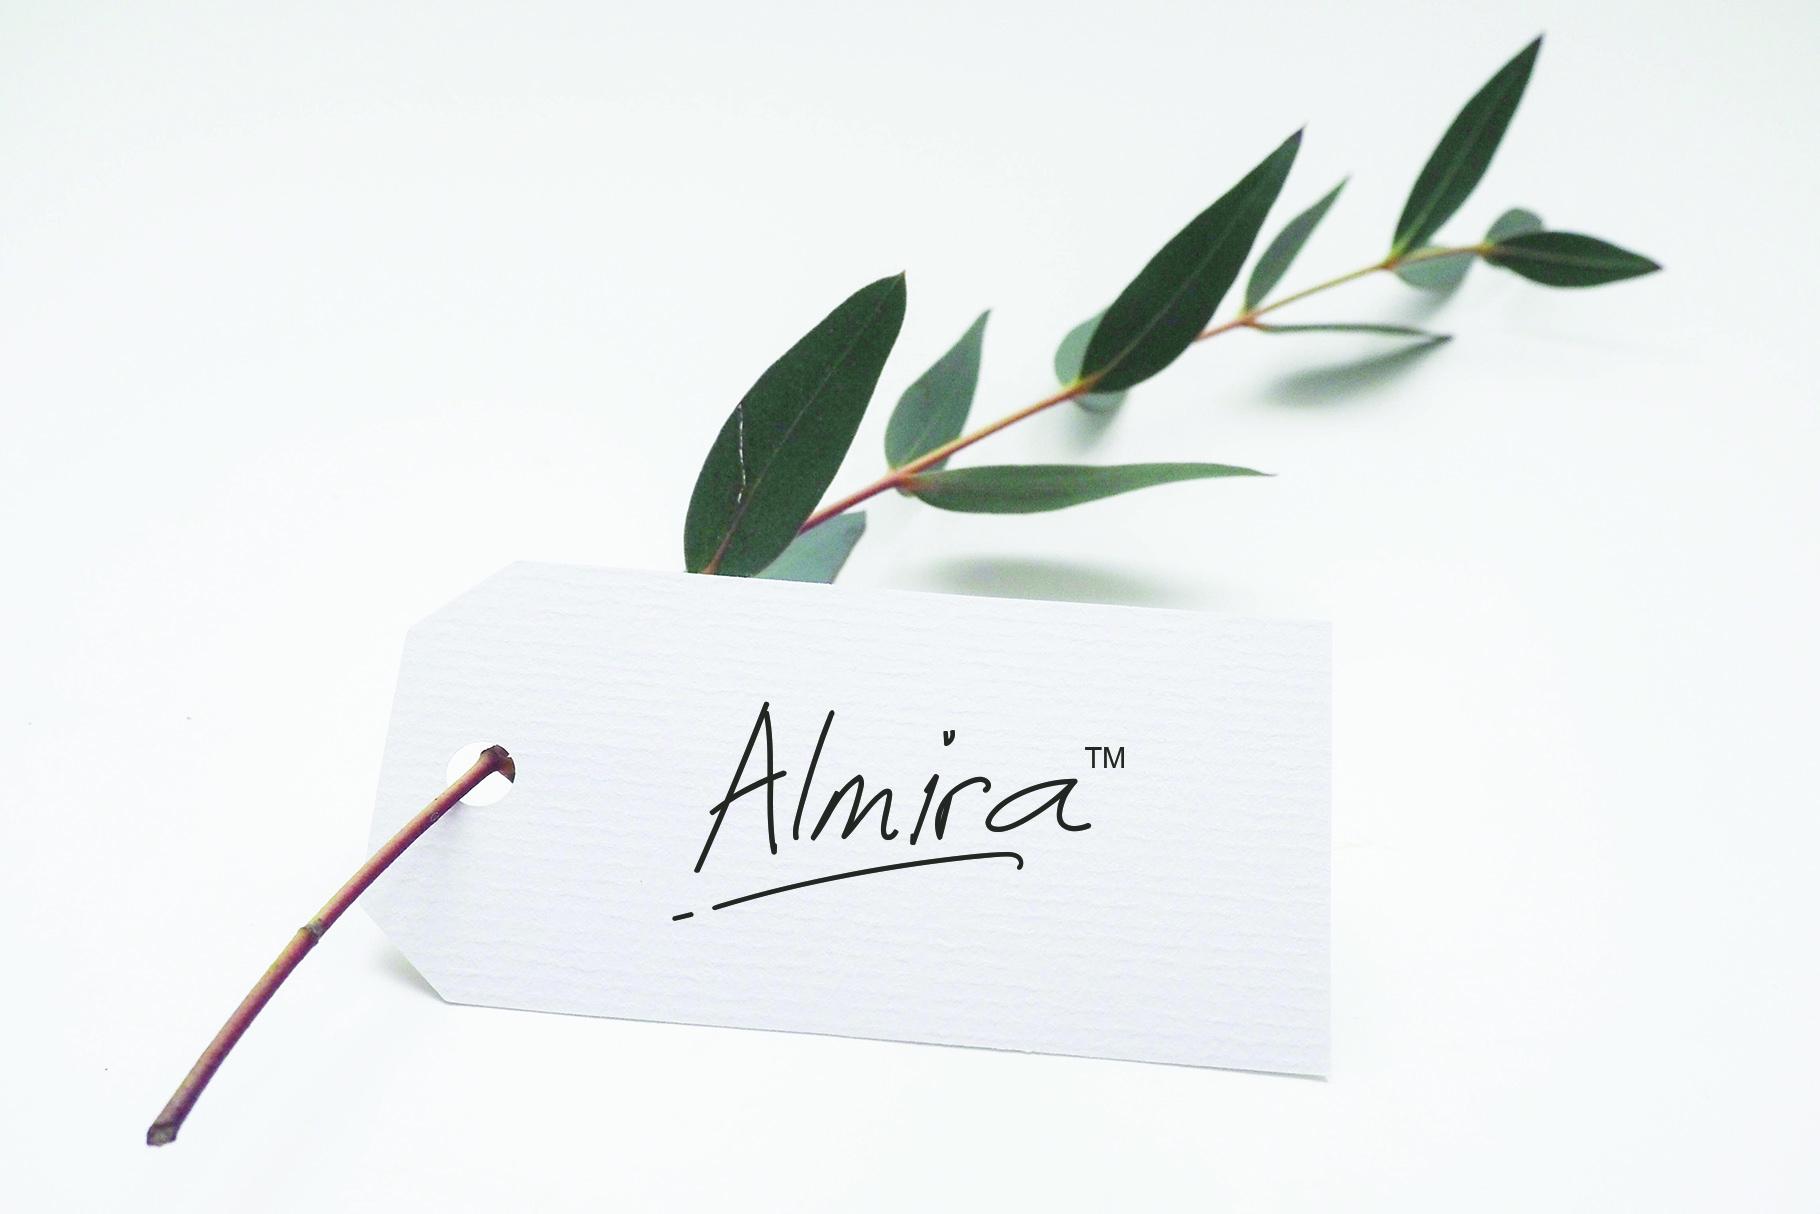 Abichondro Signature - Intro Sale example image 6